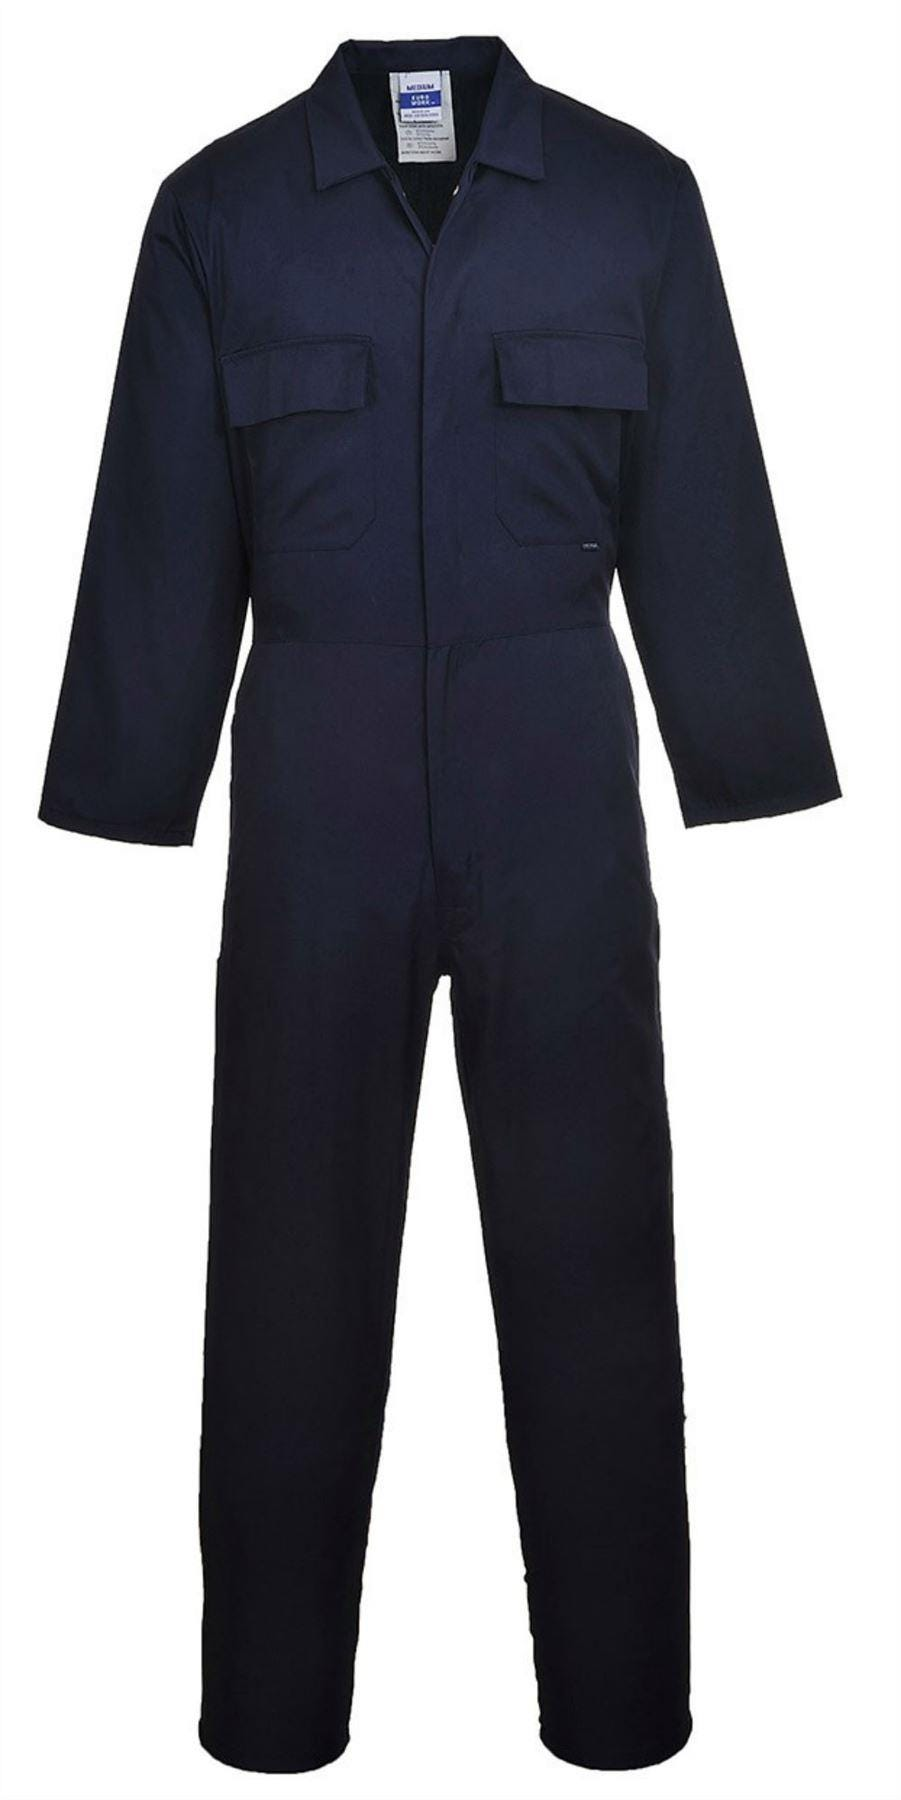 Portwest Standard Workwear Overalls - Navy 6XL